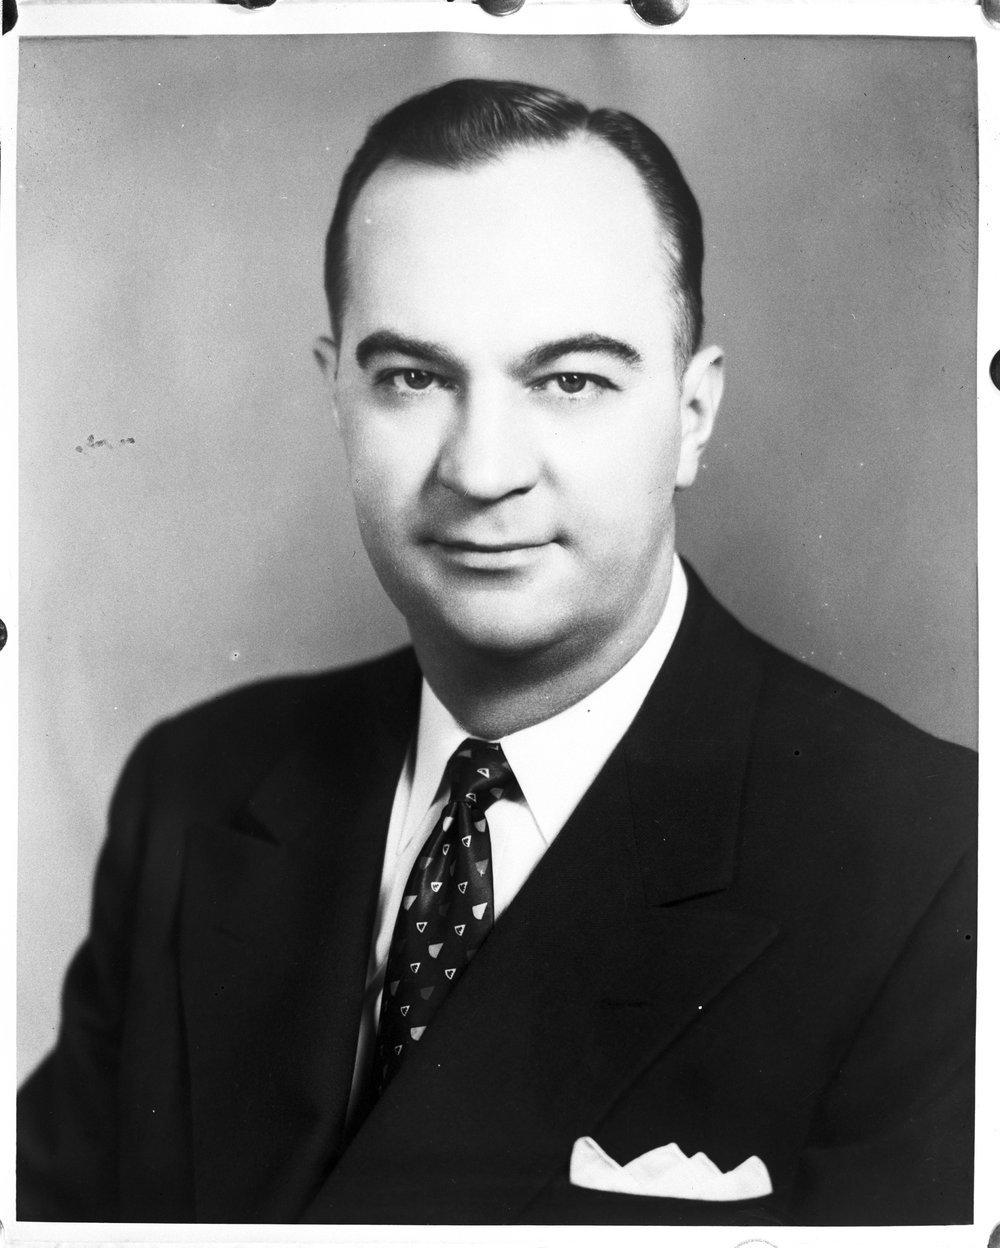 Edward Ferdinand Arn - 1